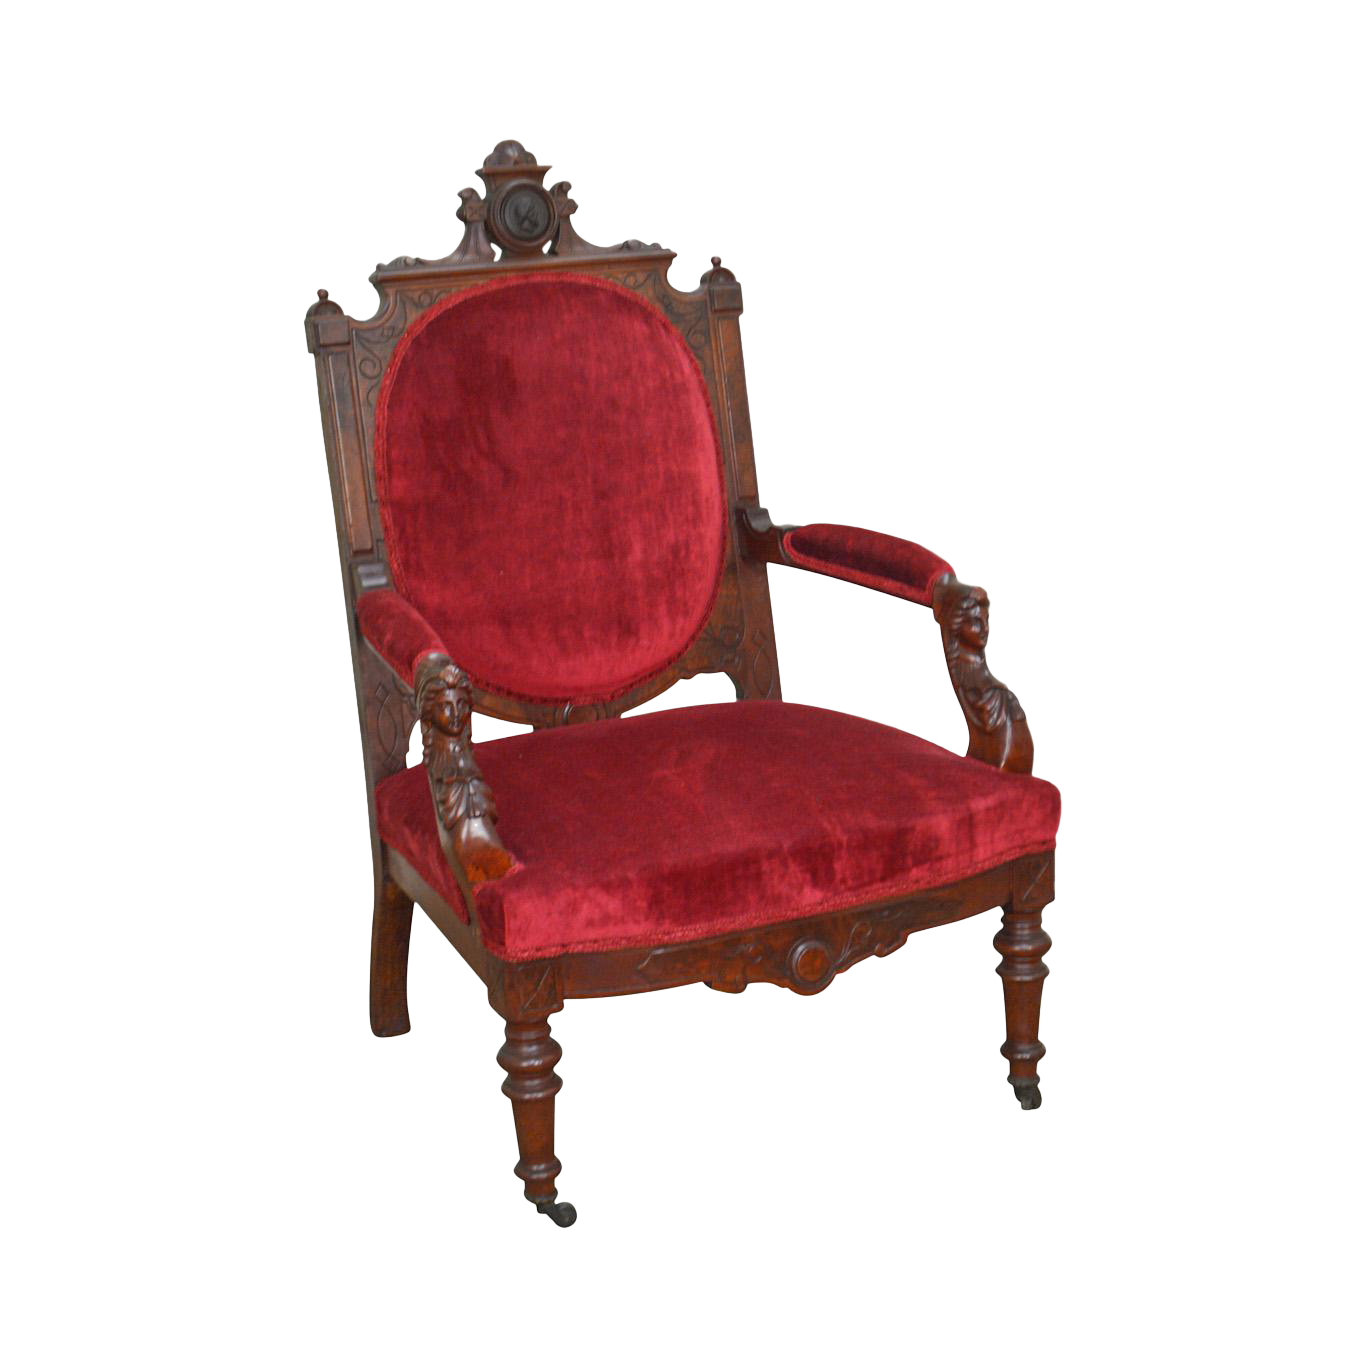 John Jelliff Antique Victorian Renaissance Carved Walnut Arm Chair (A)